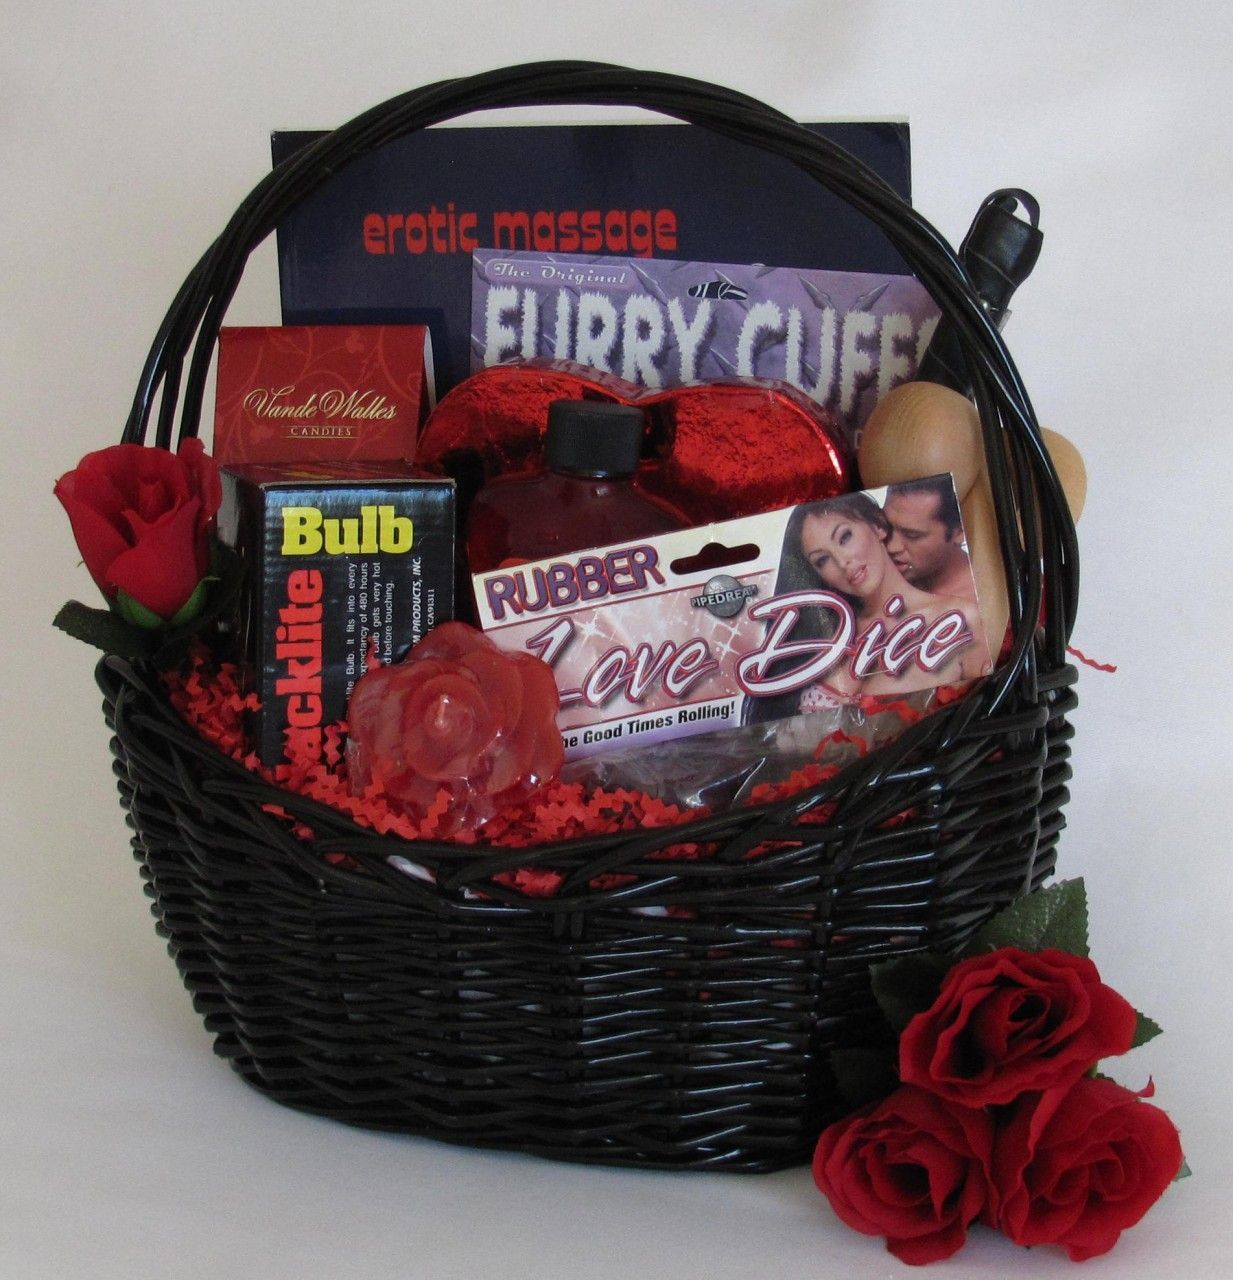 Erotic treat basket